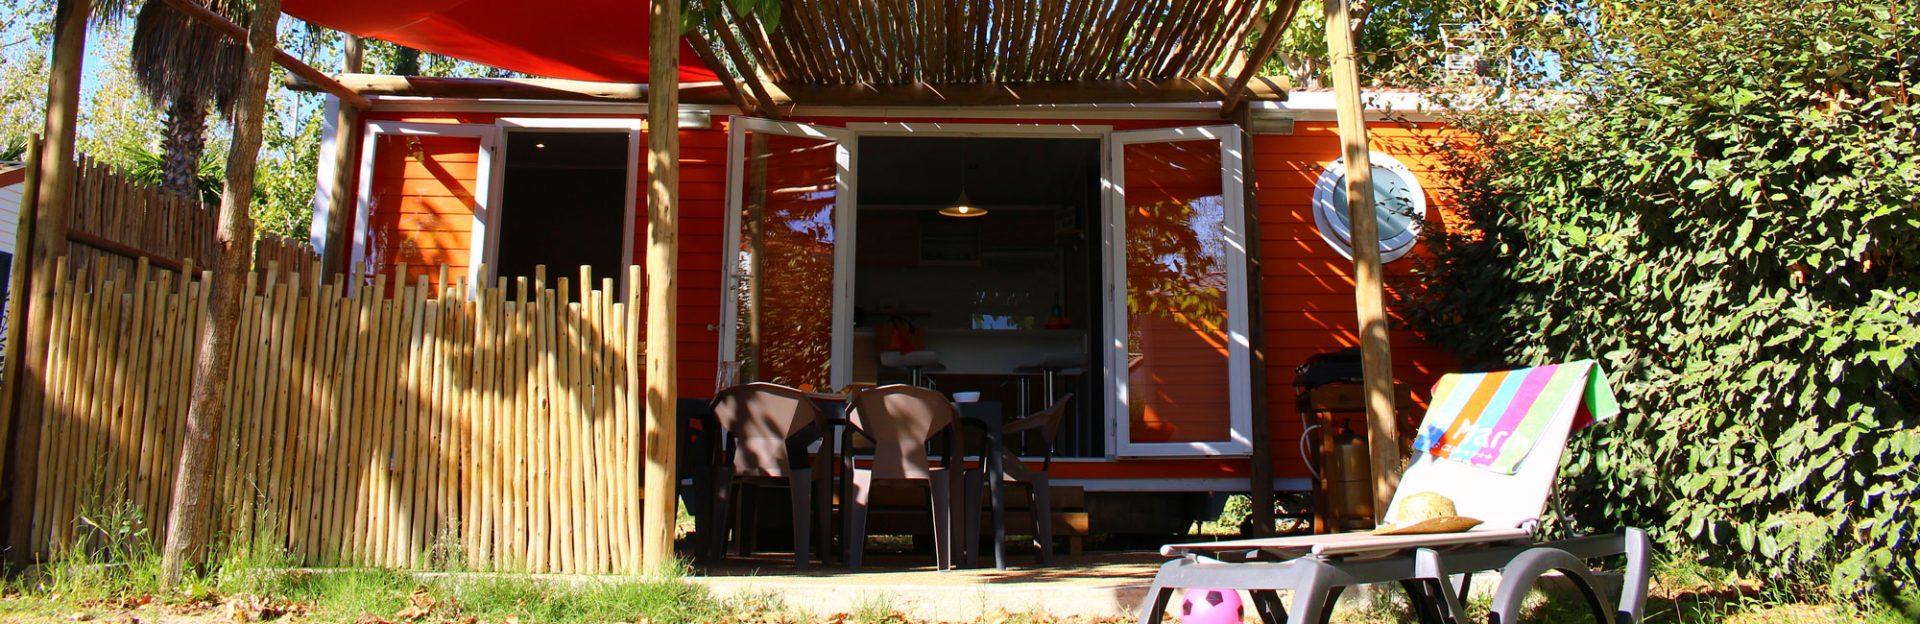 Camping L'air Marin : Mexico + Principale Diapo